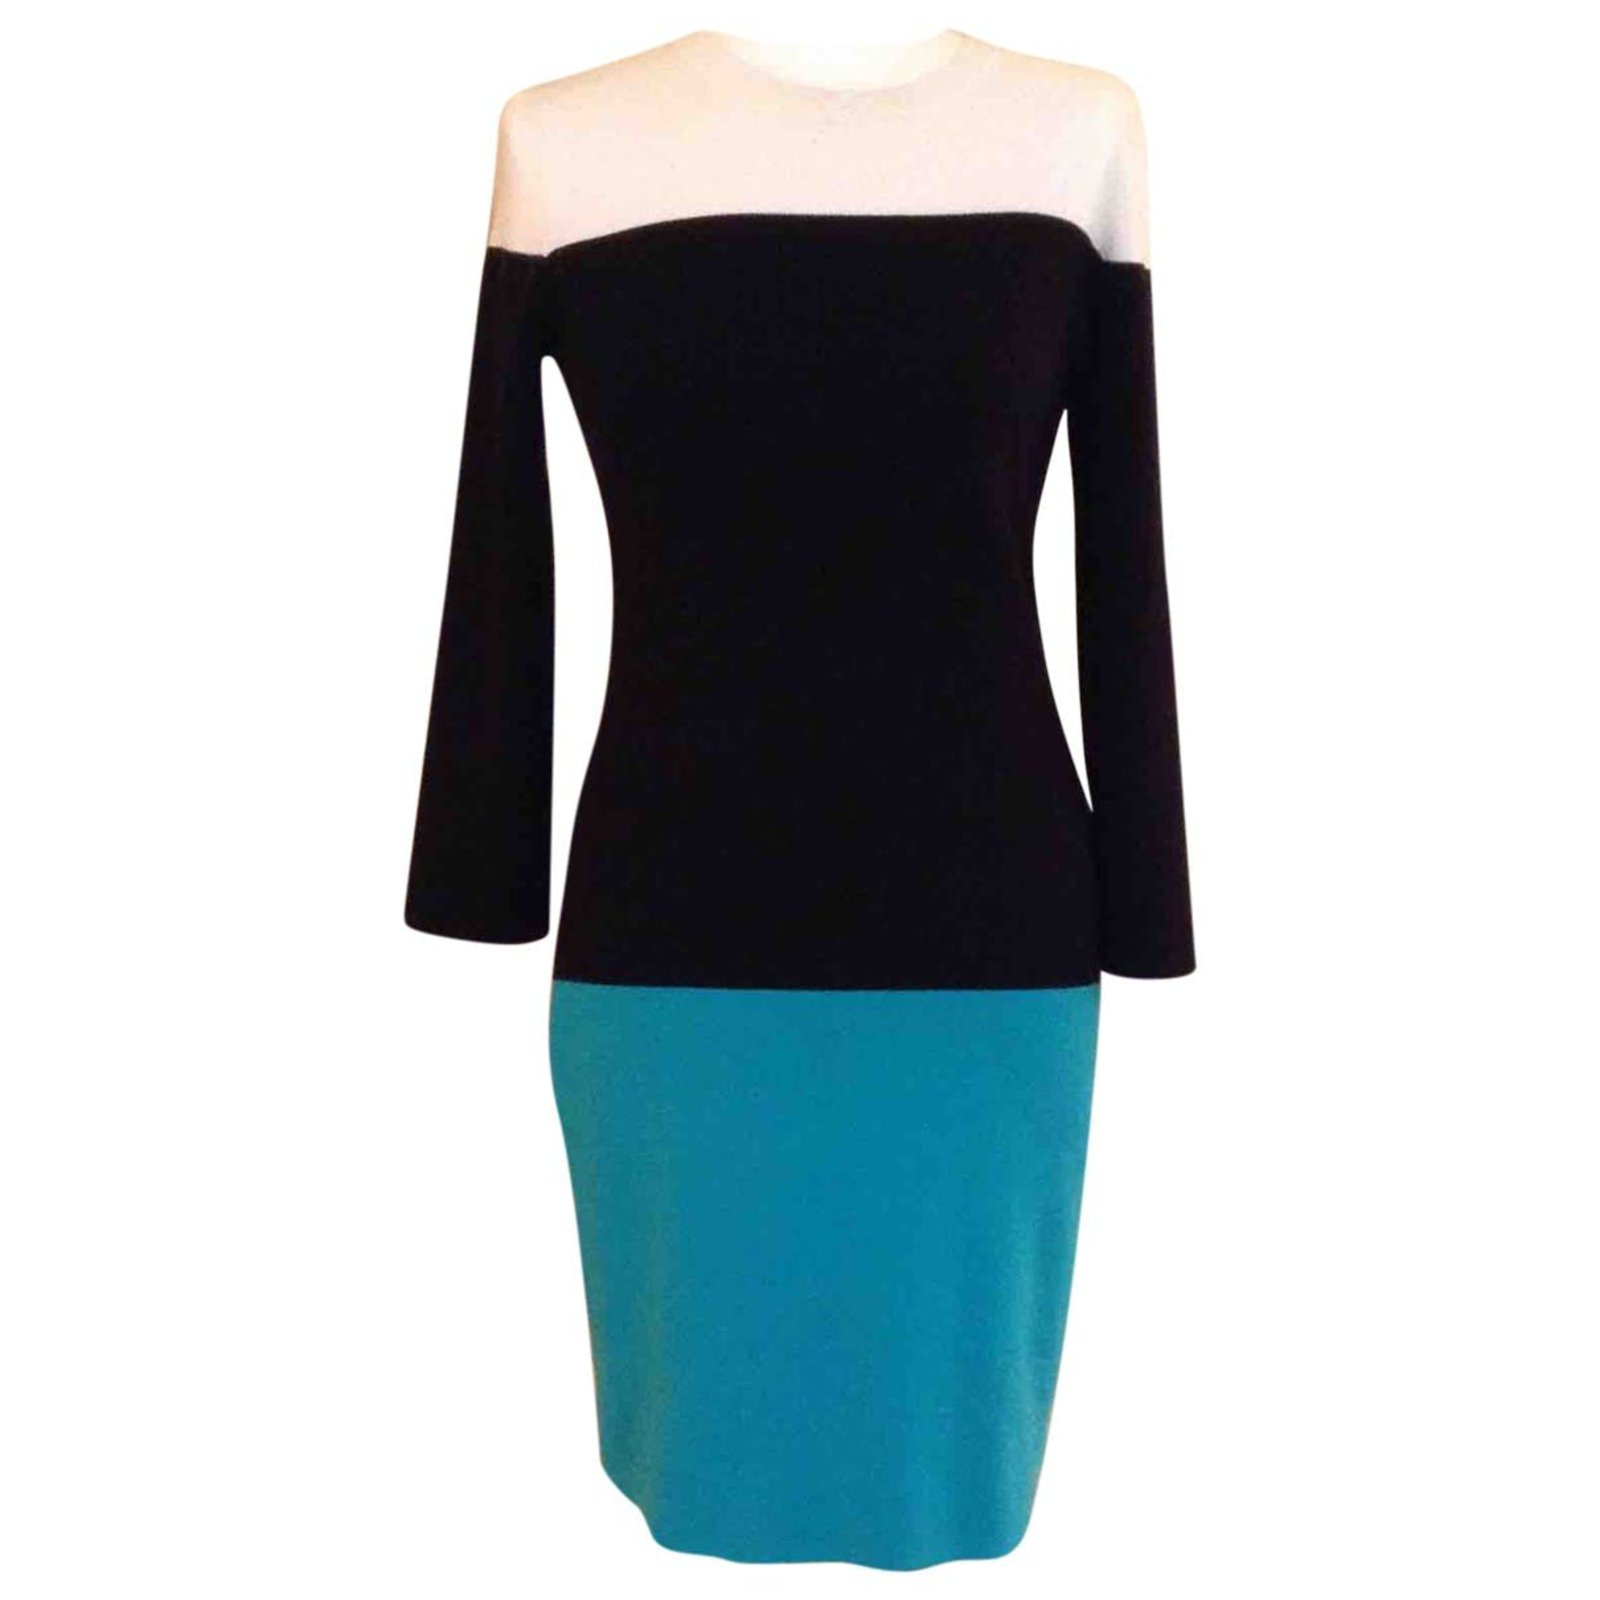 Kors Fashion Kors Michael – Michael Michael Fashion Kors Dresses Dresses Dresses – – T1JcFK3l